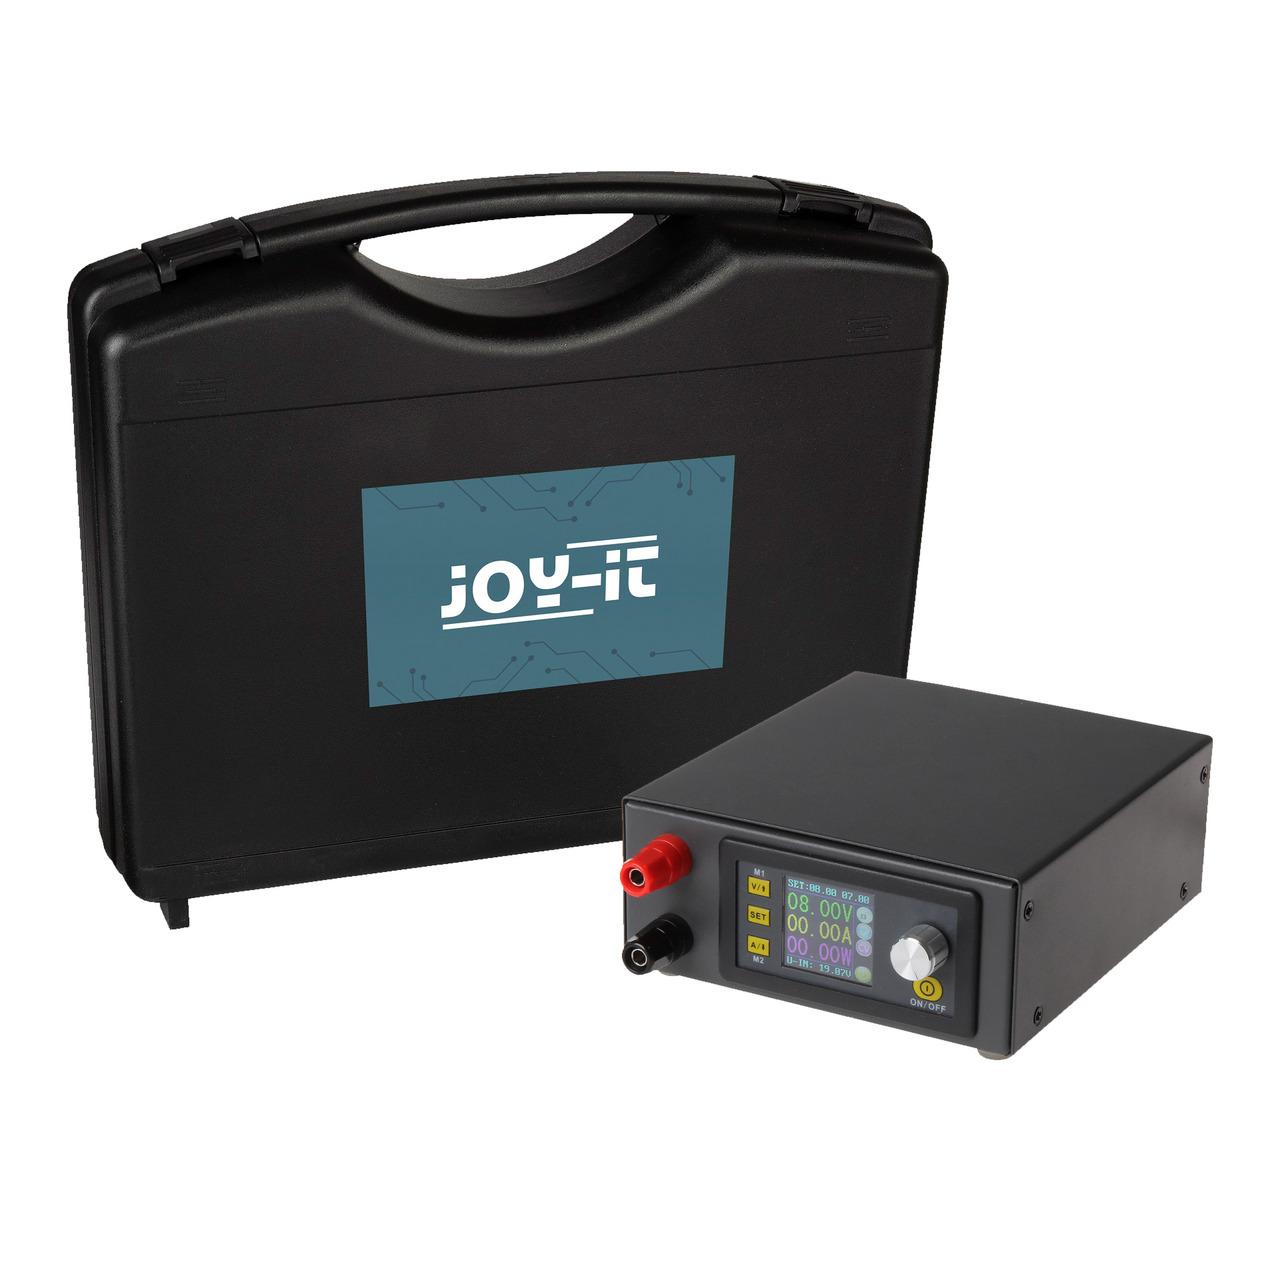 Joy-IT Step-up-Labornetzgerät JT-DPS5005 Set- inkl- Gehäuse und Zubehör- 0-50 V-0-5 A- max- 250 W